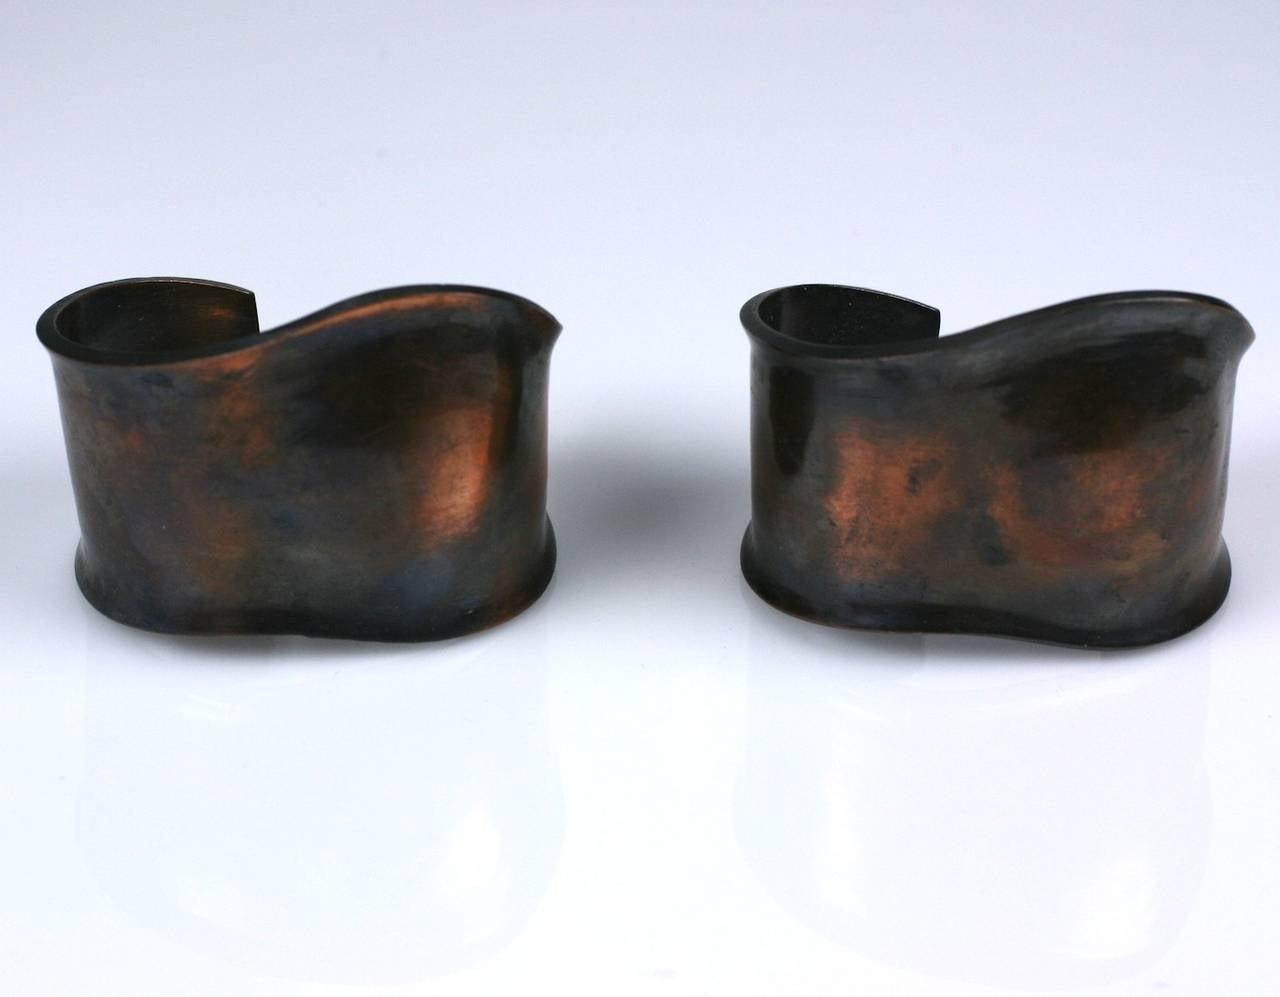 Peretti Style Modernist Copper Cuffs 4